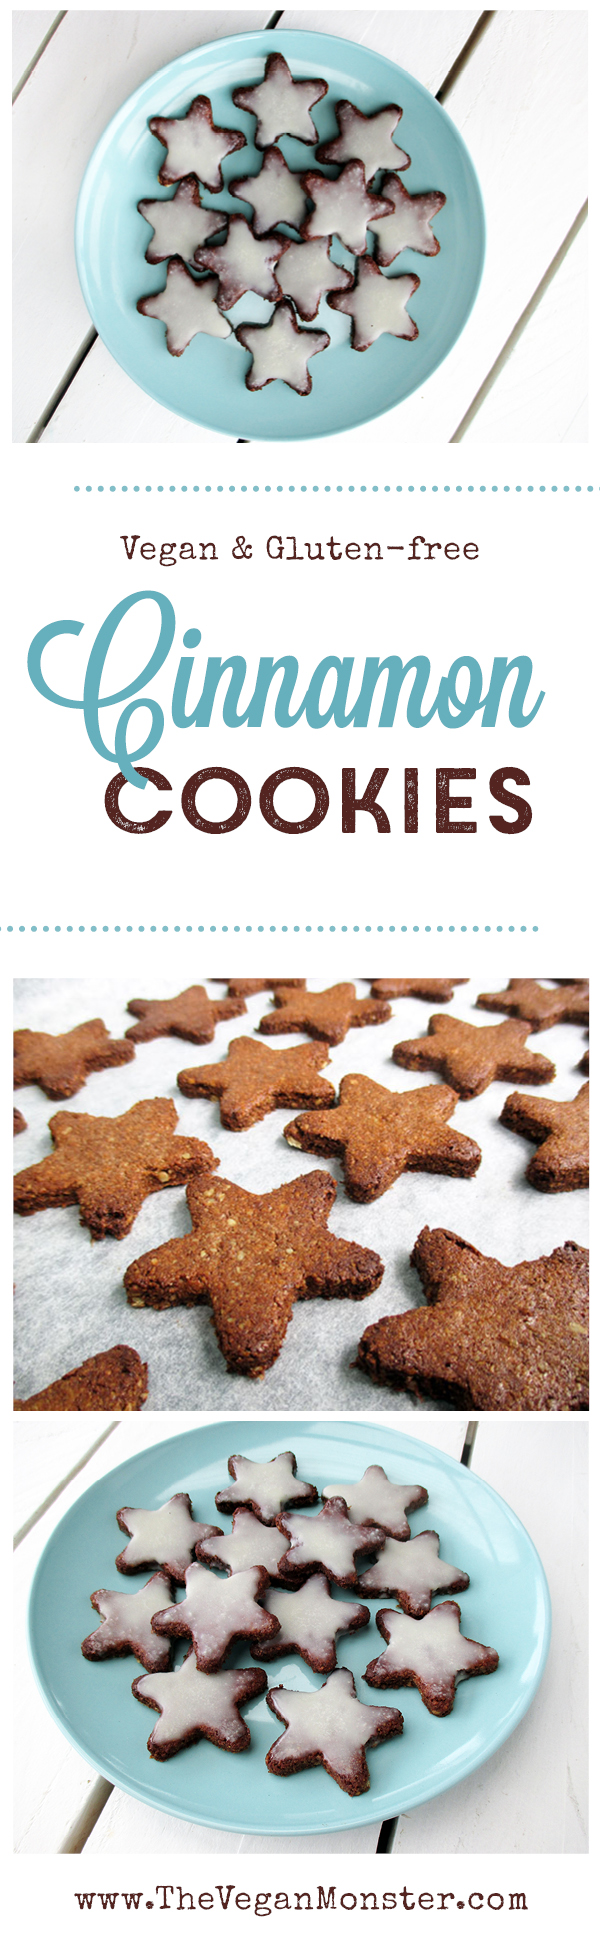 vegan gluten-free no-refined-sugar egg-free christmas cinnamon cookies recipe